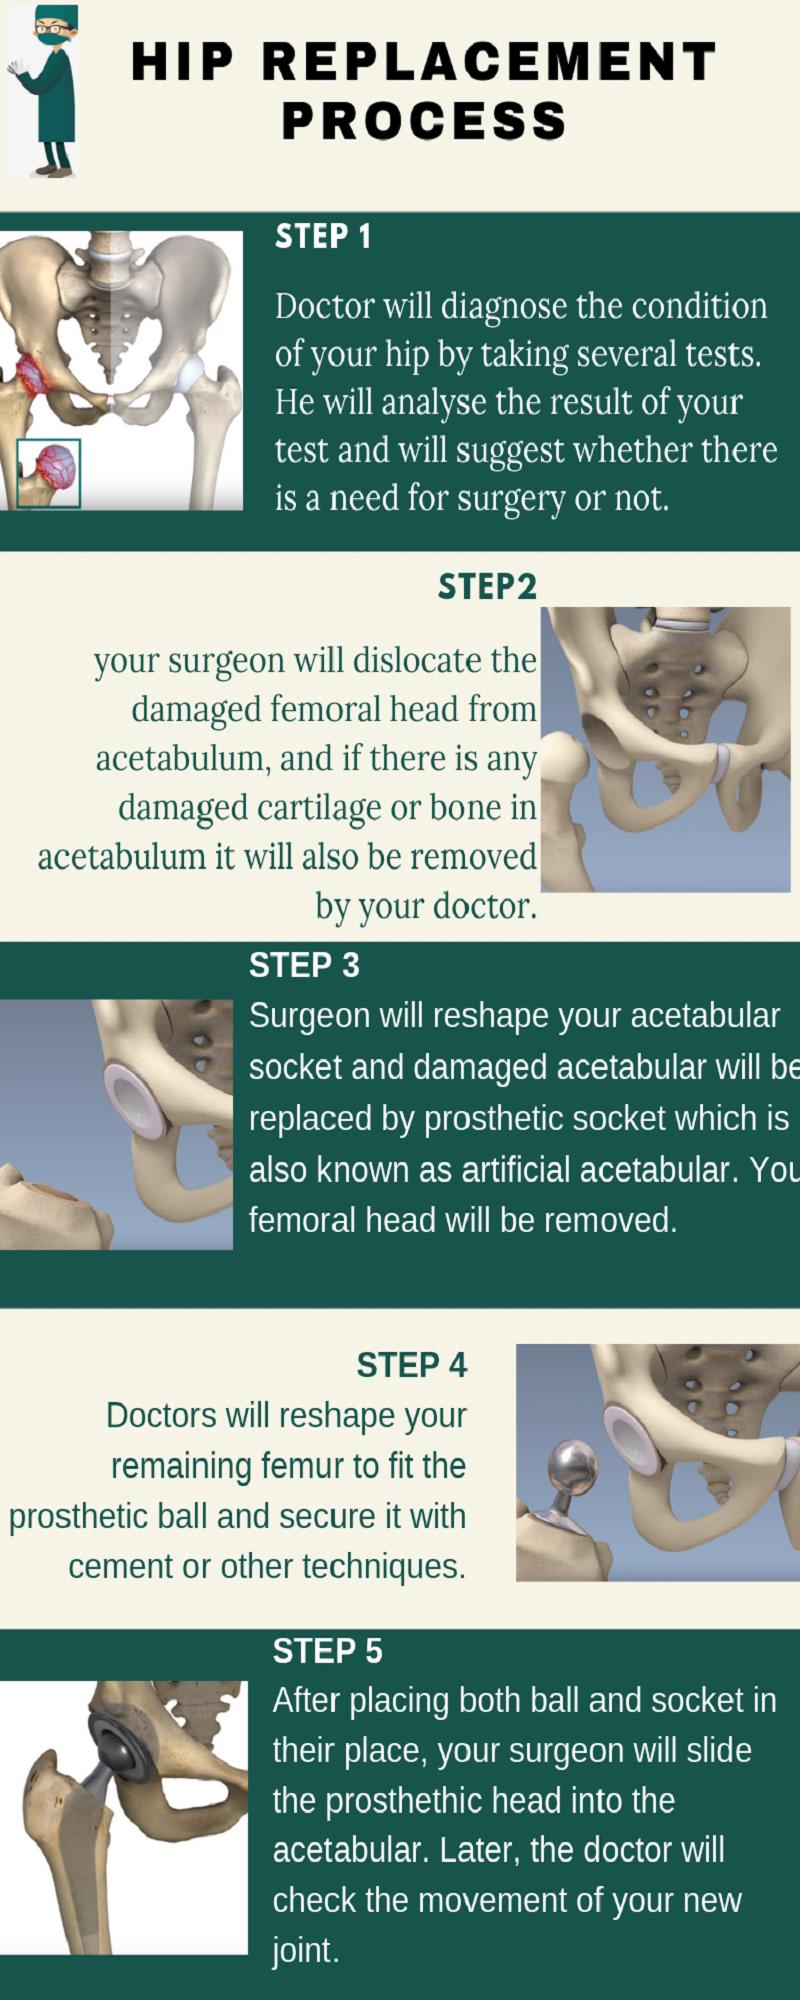 Hip Replacement process